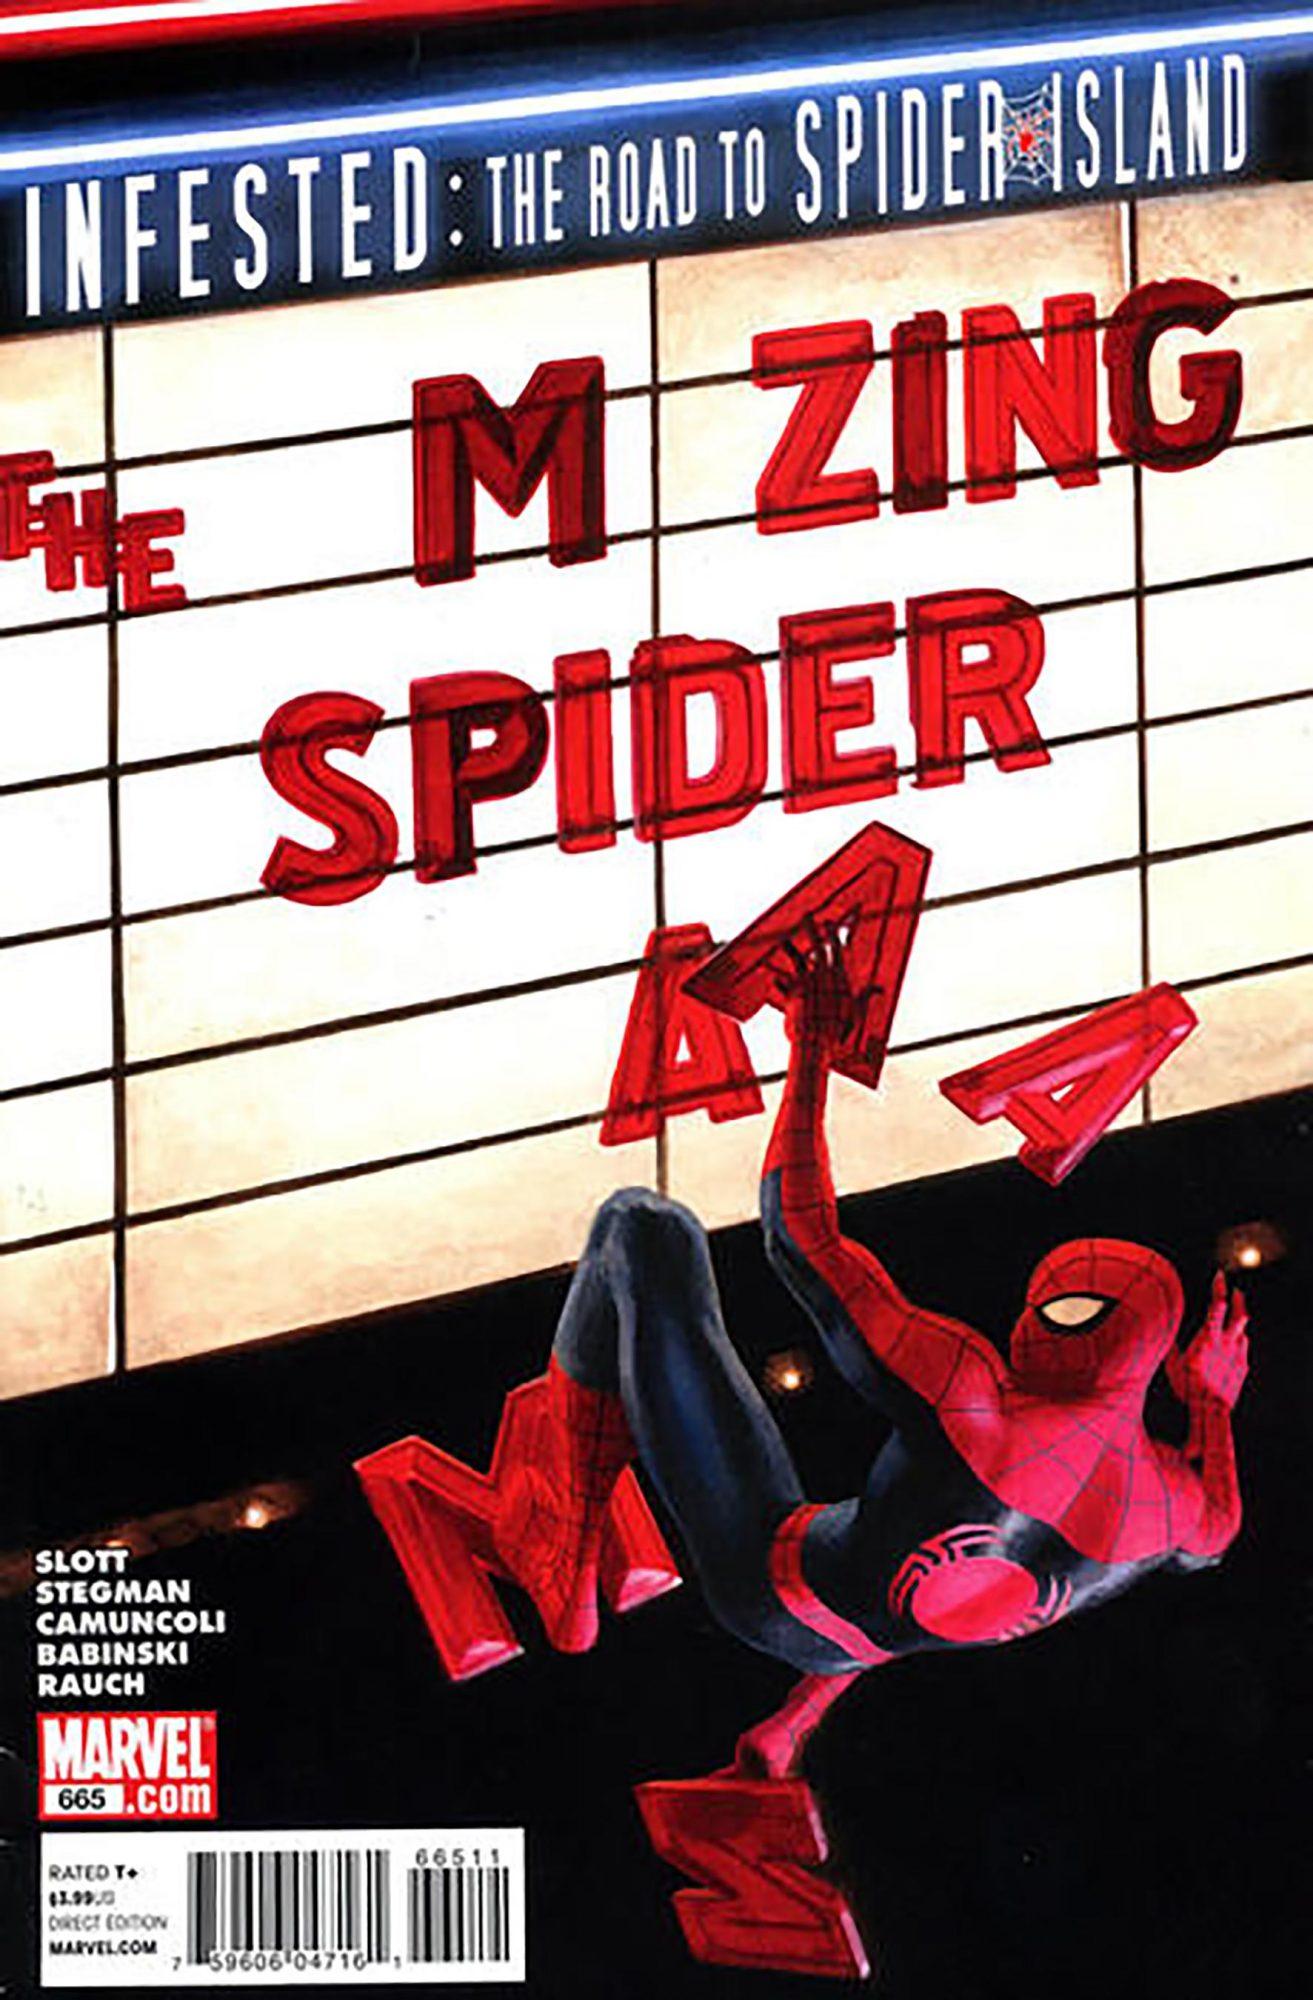 Amazing Spider-Man #665Artist: Paolo Rivera, 2011